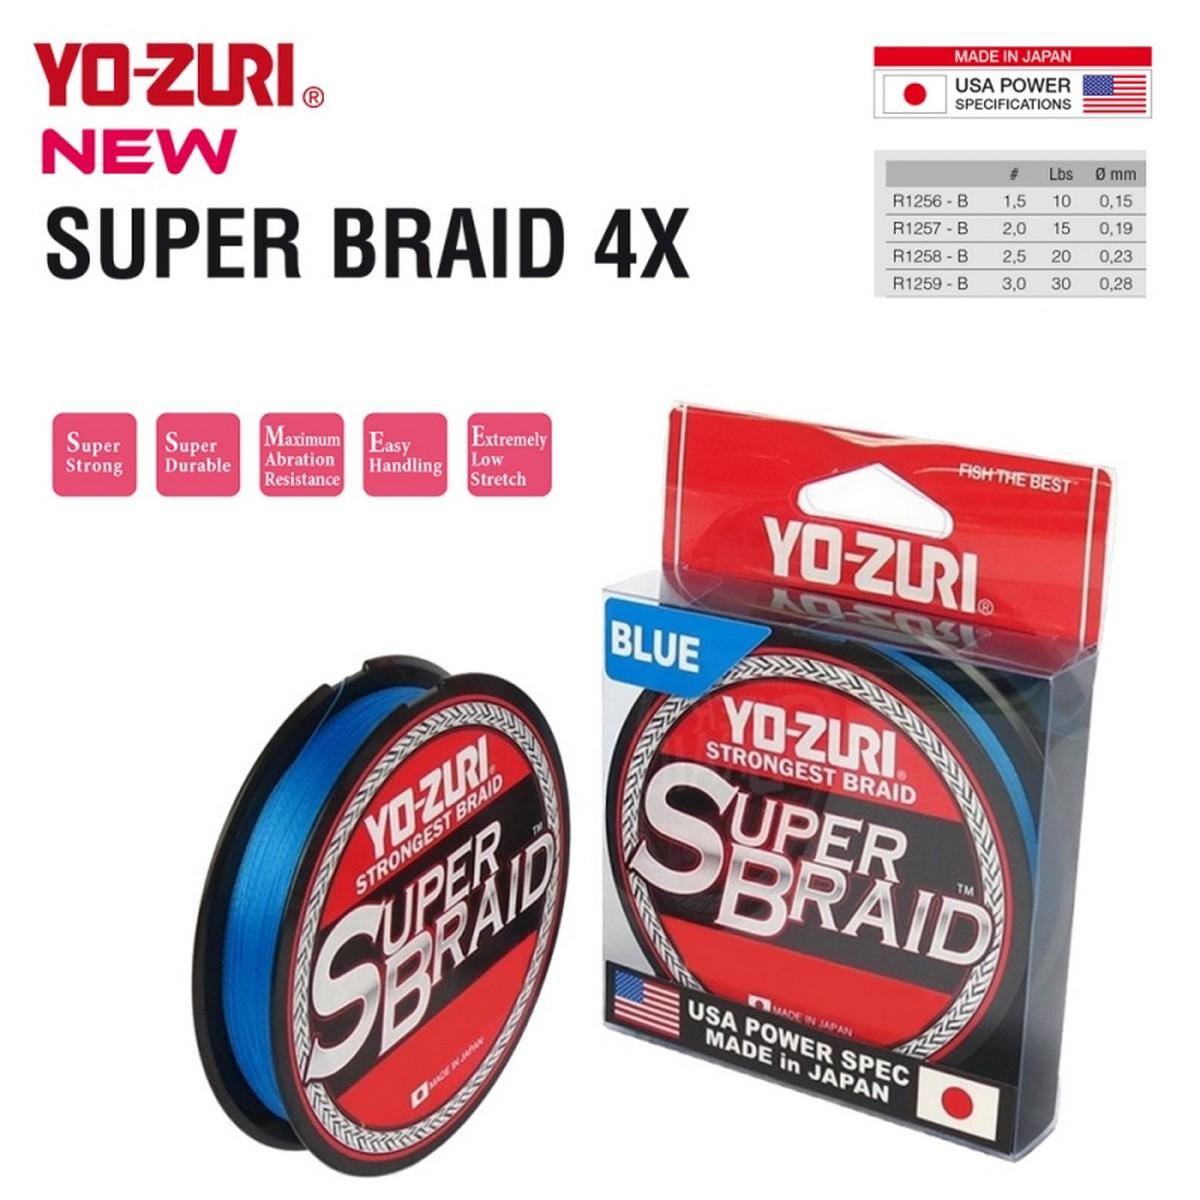 Плетено влакно Yo-Zuri Super Braid 4x